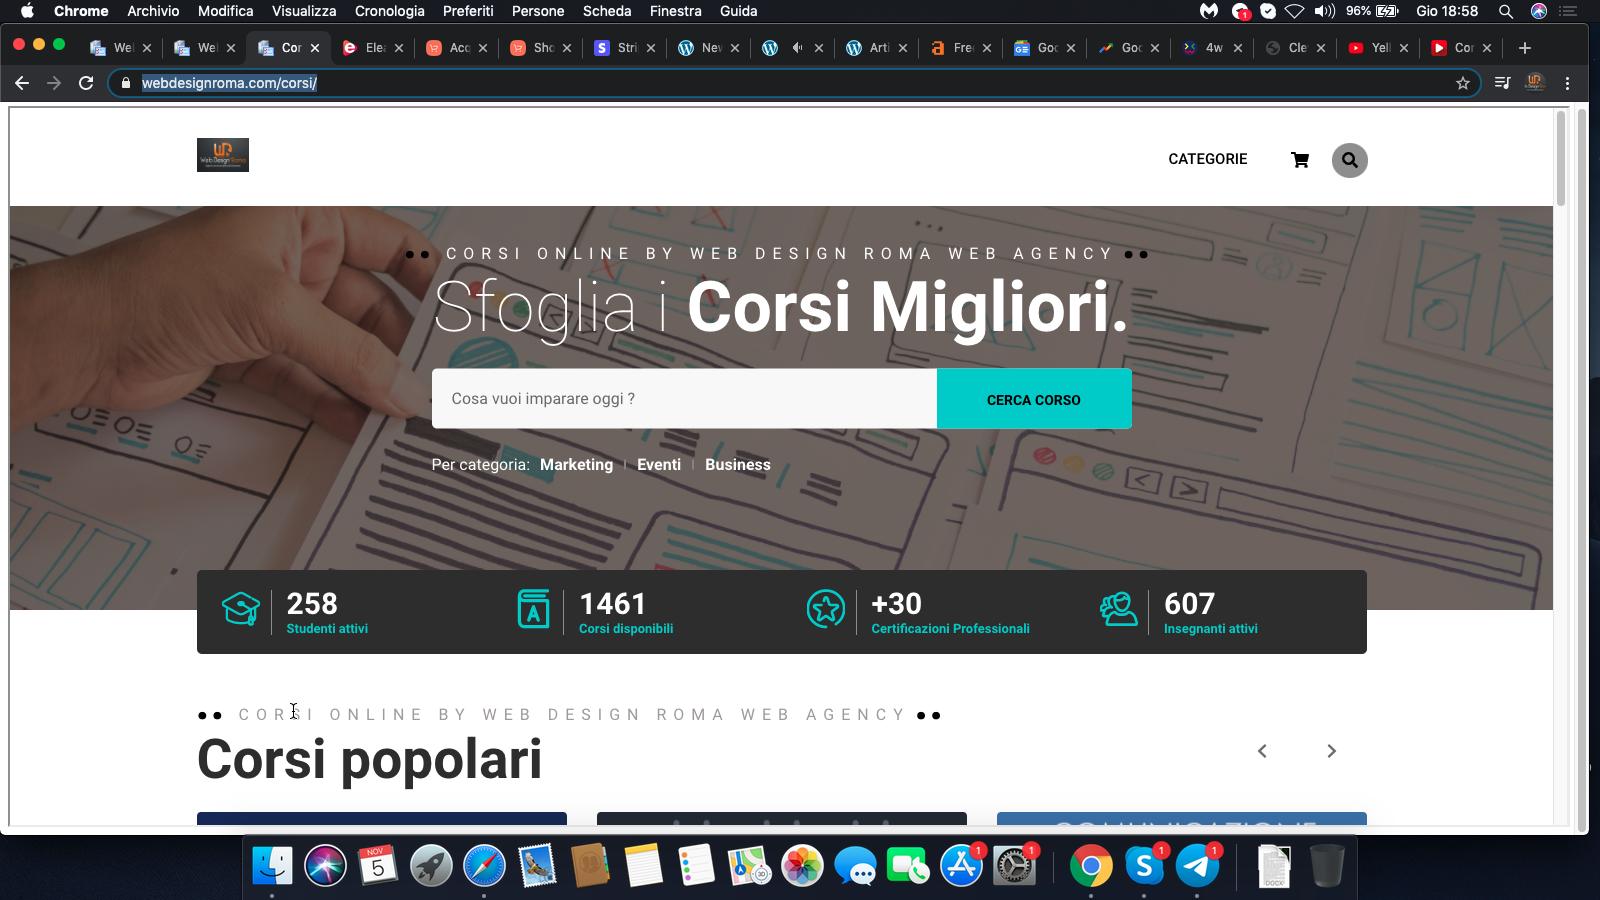 Corsi Online by WebDesignRoma Web Agency